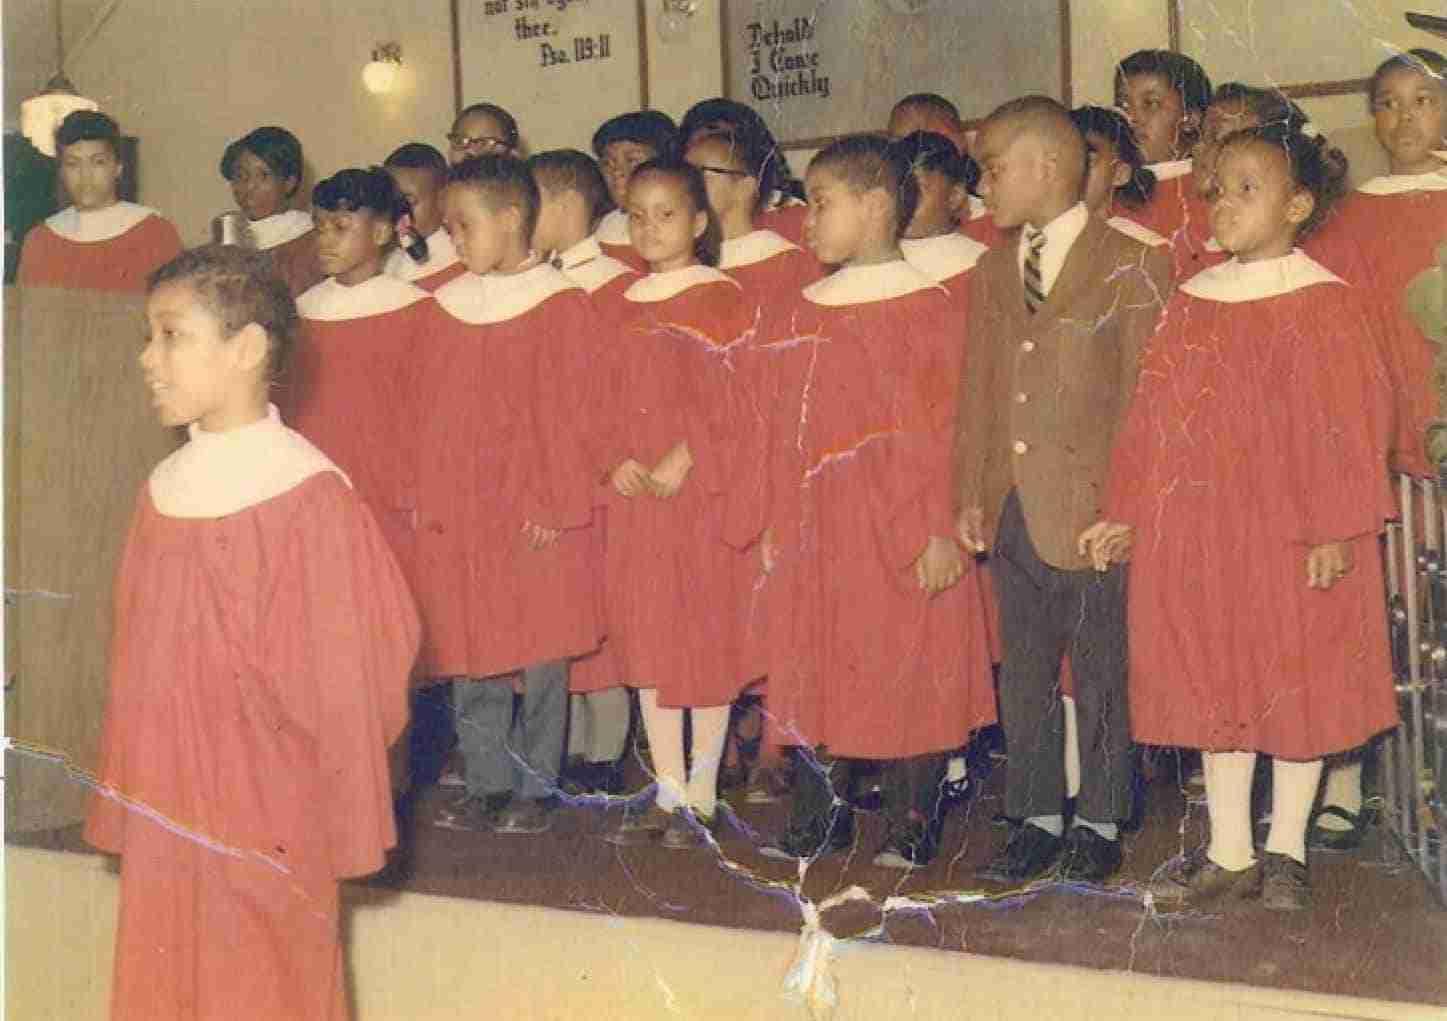 Pastor Kevin Gregg - Youth Choir Director